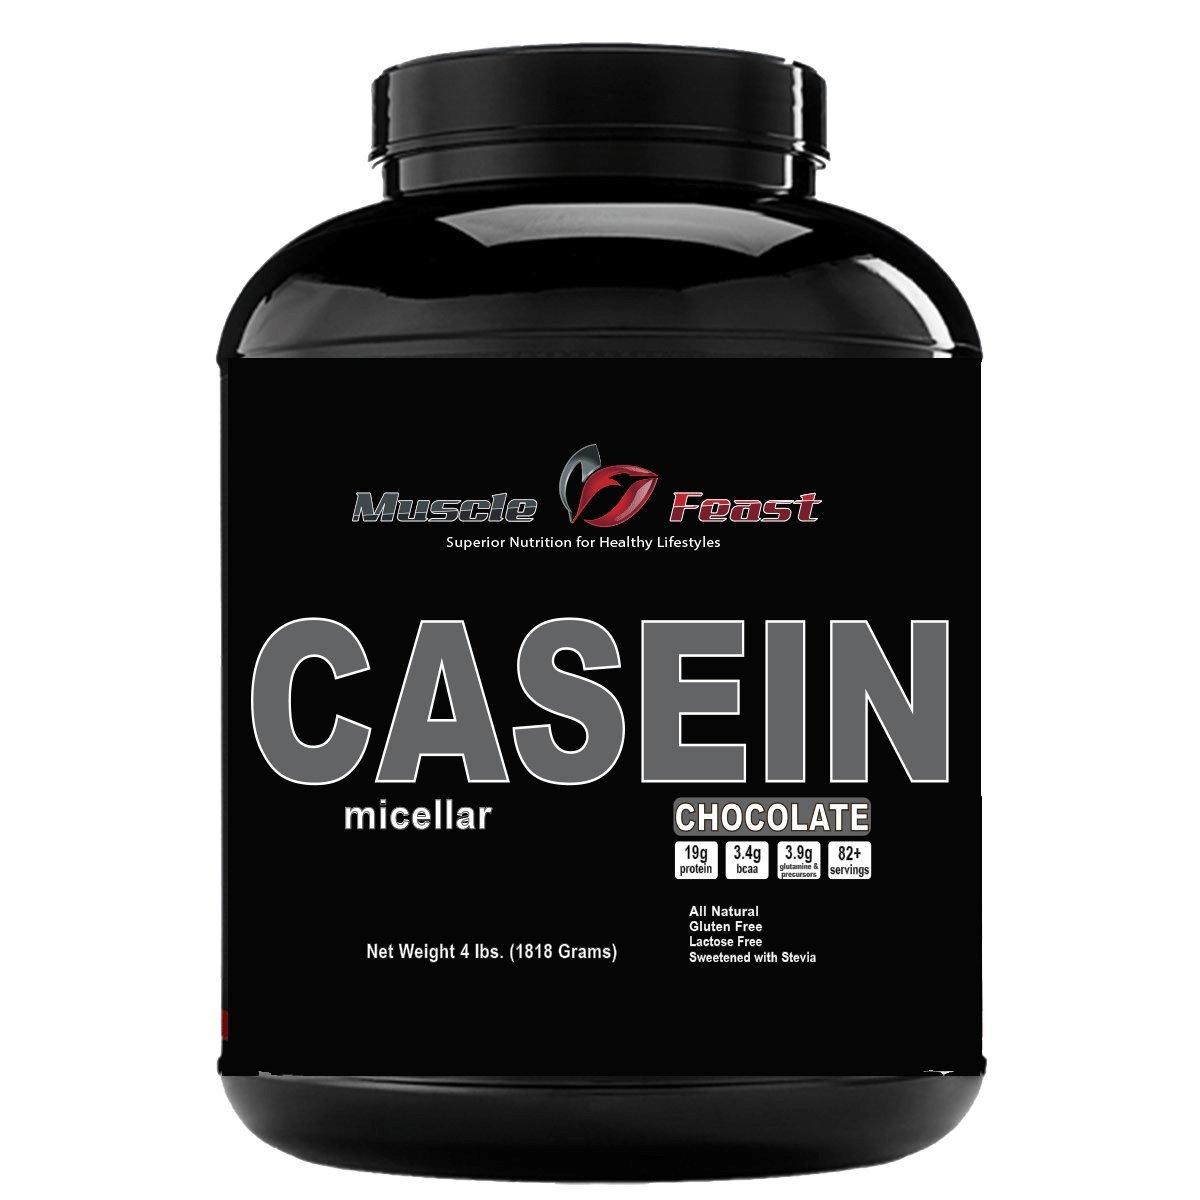 Micellar Casein - 4lbs (Chocolate)